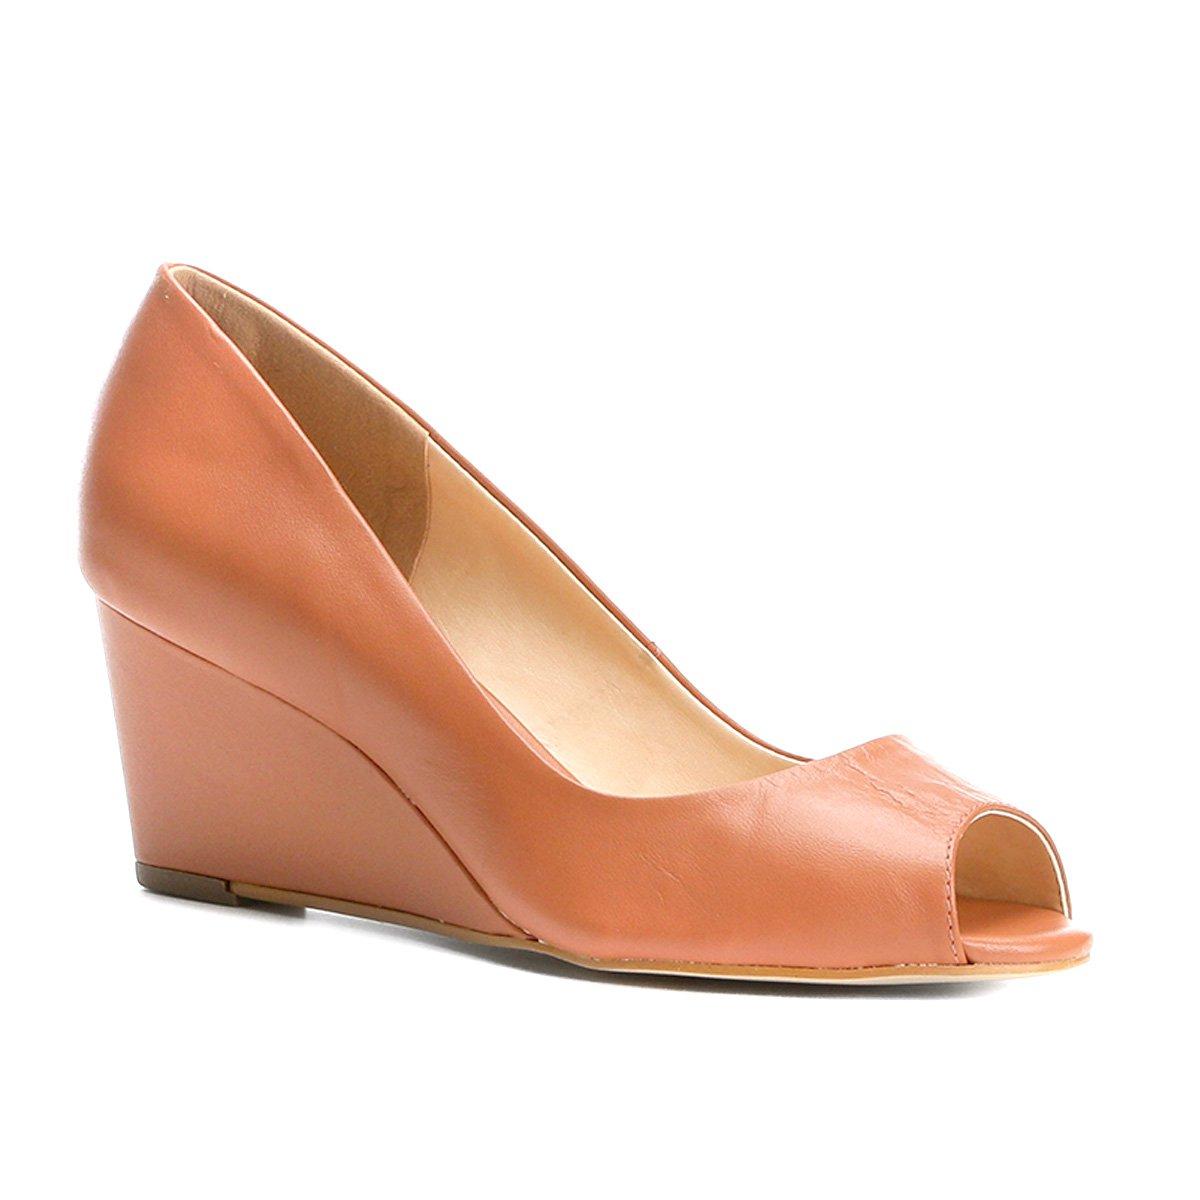 9ce89391ee2 Peep Toe Couro Shoestock Anabela - Marrom - Compre Agora